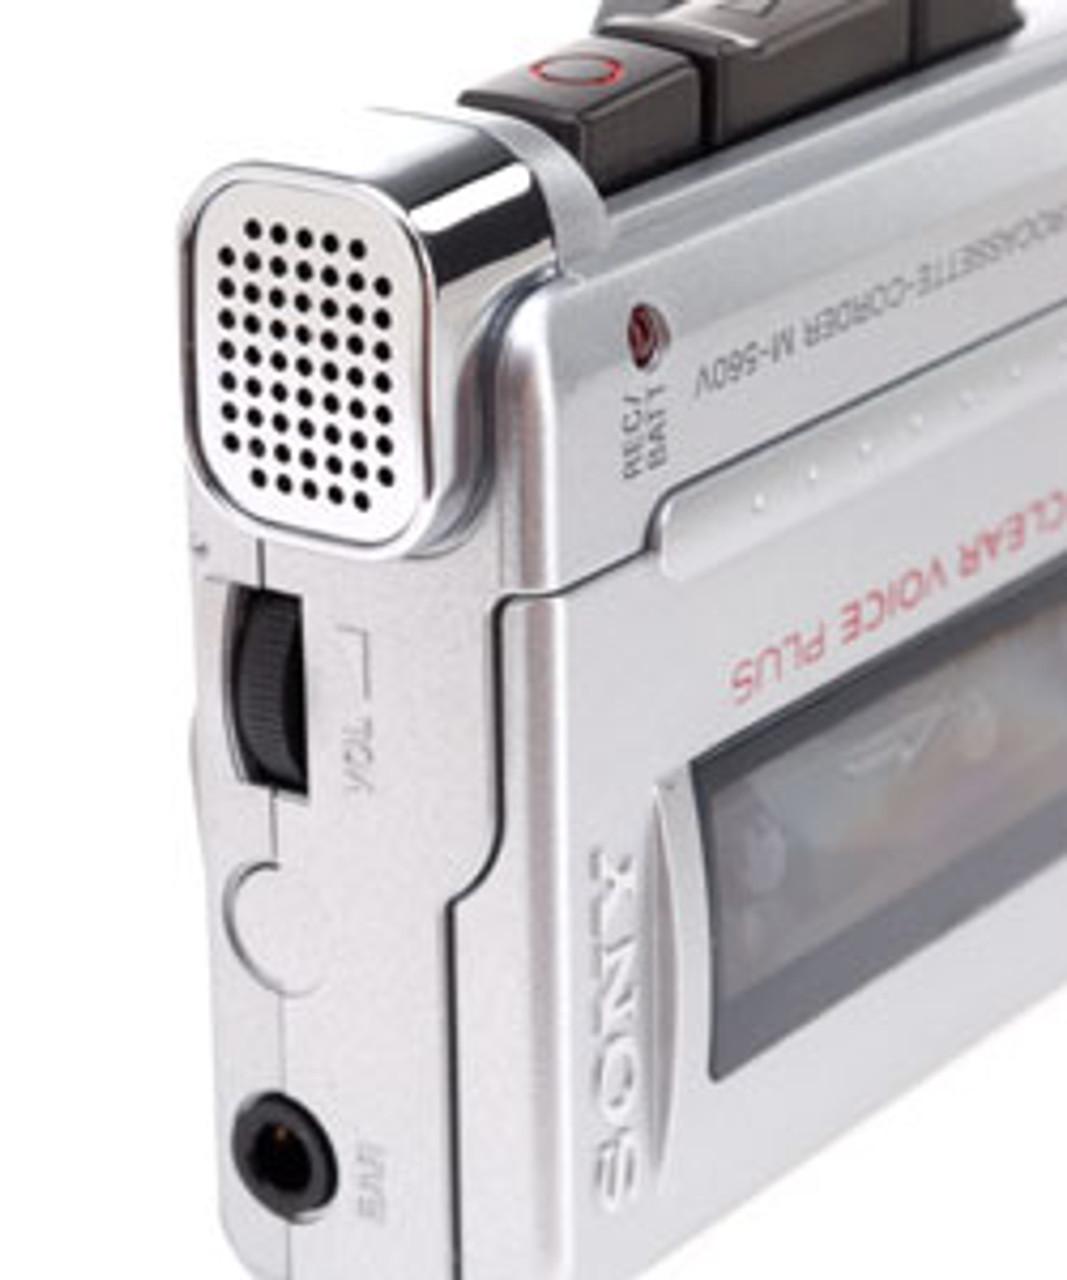 Sony M-560V Micro-cassette Voice Recorder